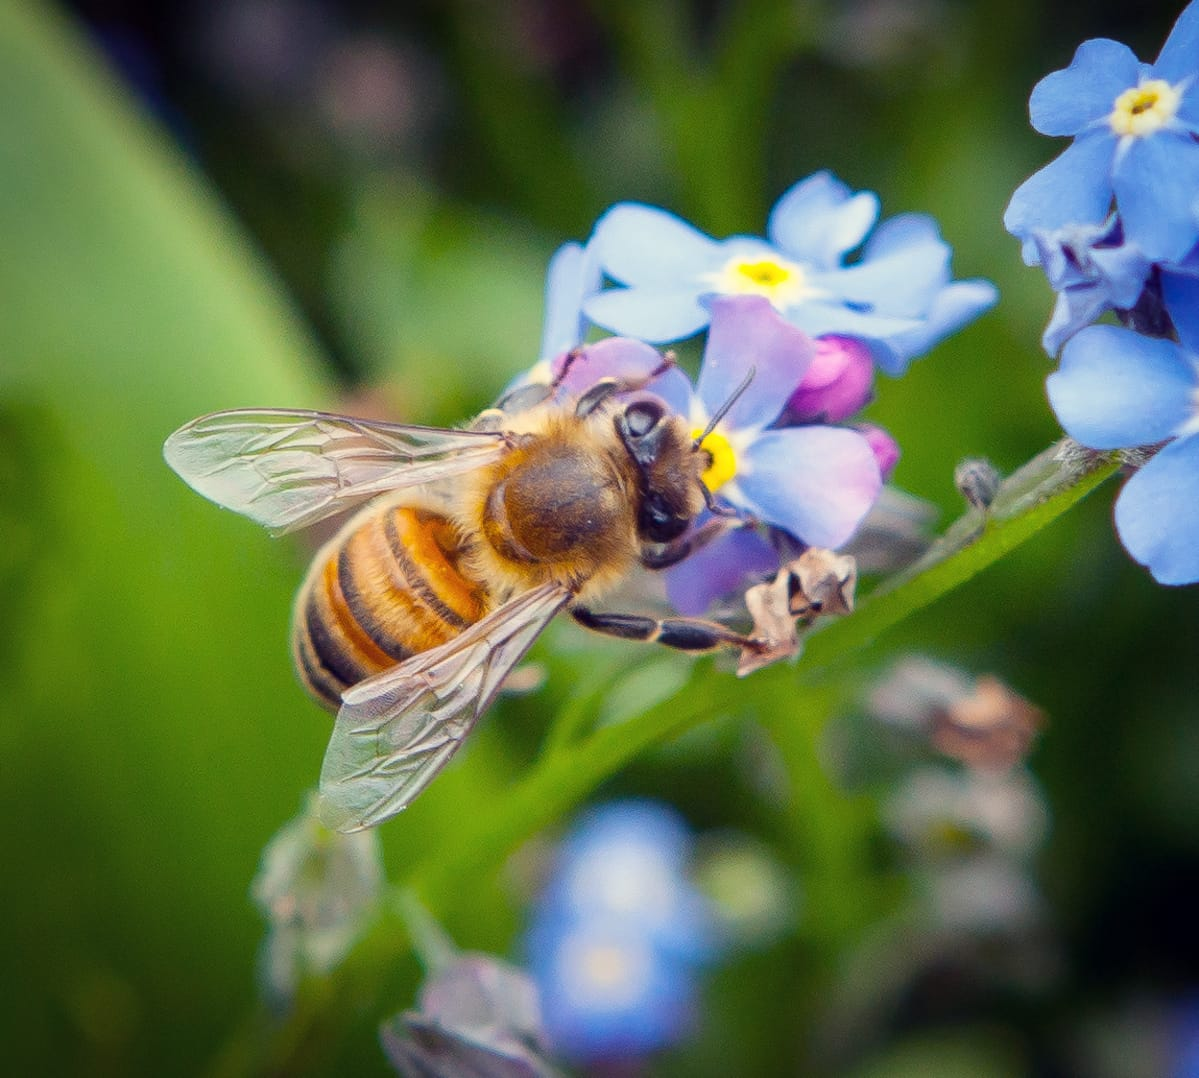 Baijerin mehiläiset.